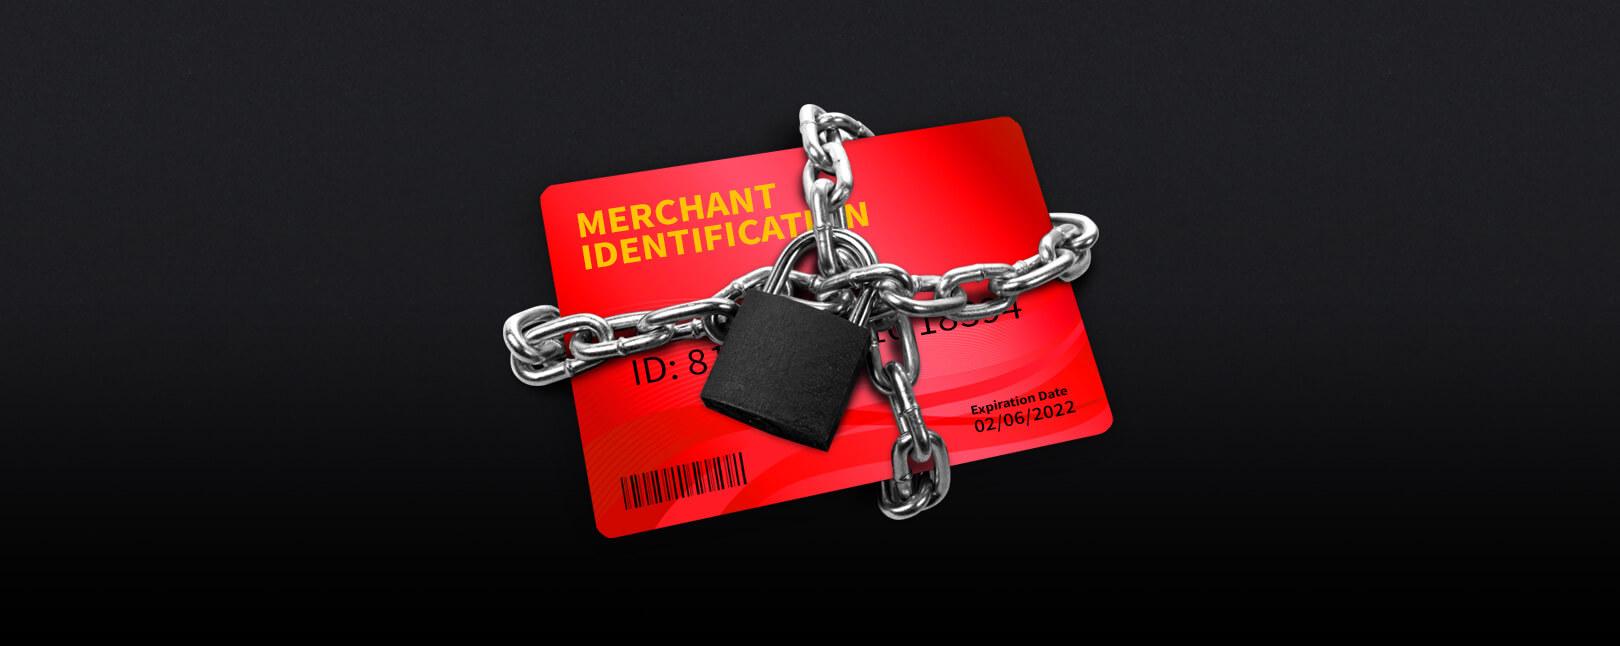 Merchant Identification Number